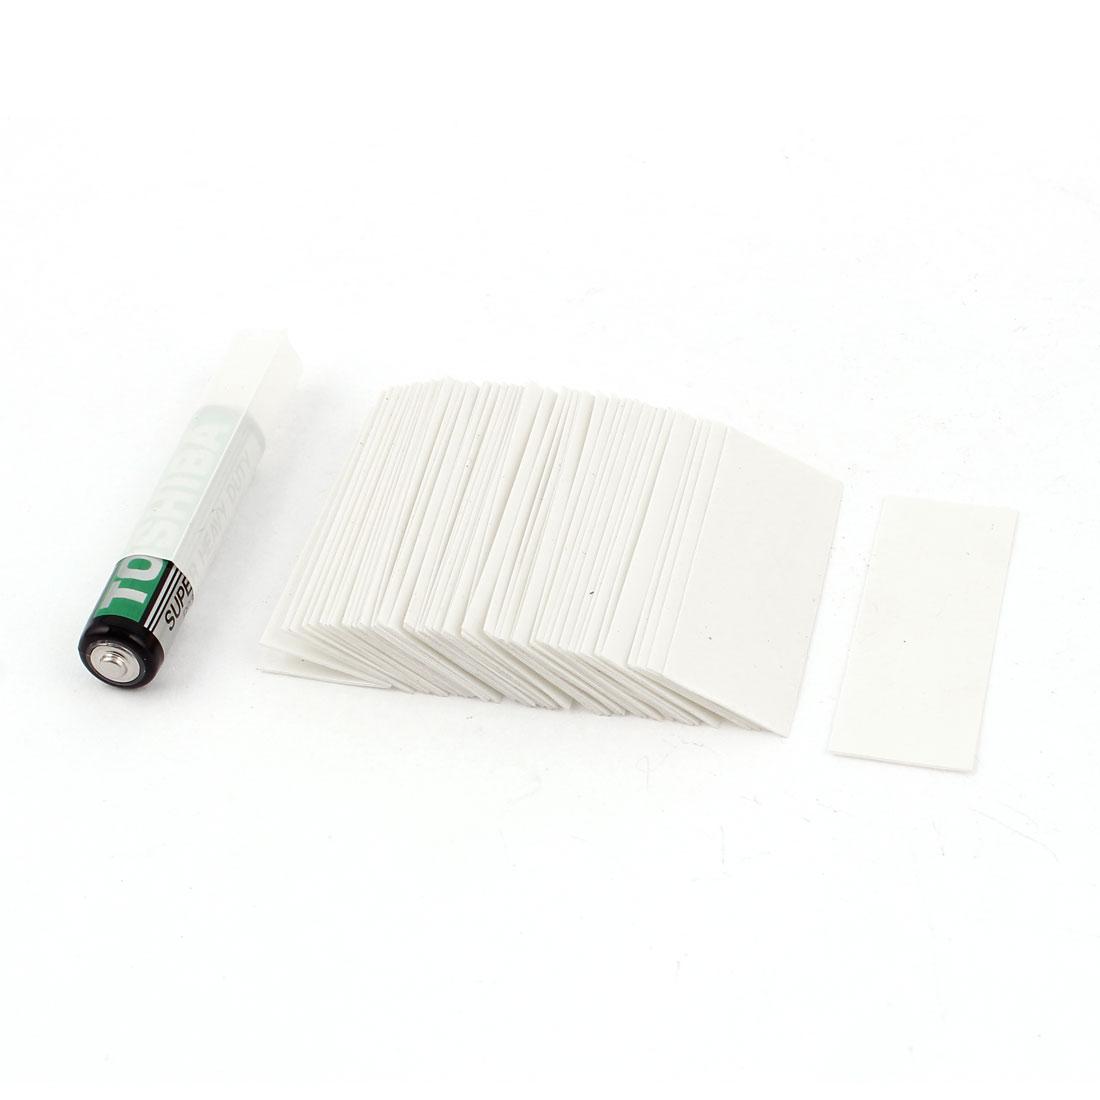 50pcs 17mm 10.8mm Dia PVC Heat Shrink Tubing White for 1 x 1.5V AAA Battery